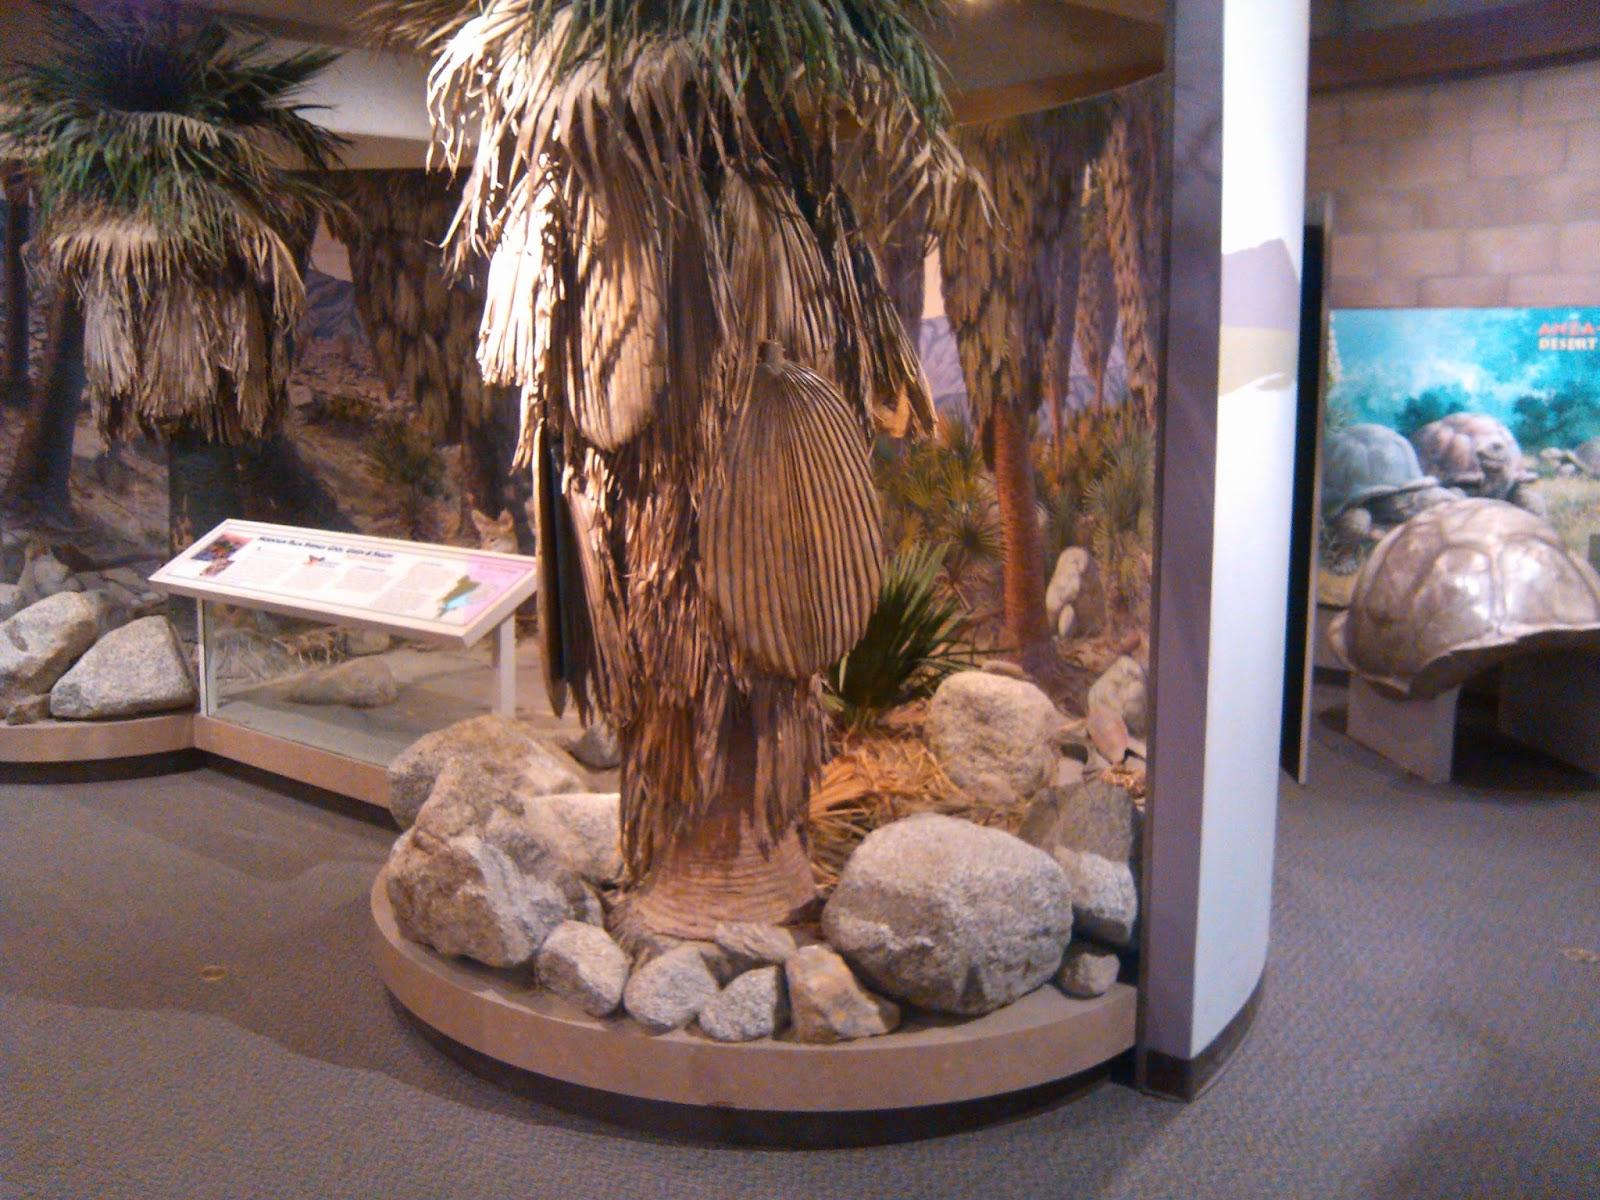 Visitor Center: Anza-Borrego Desert State Park